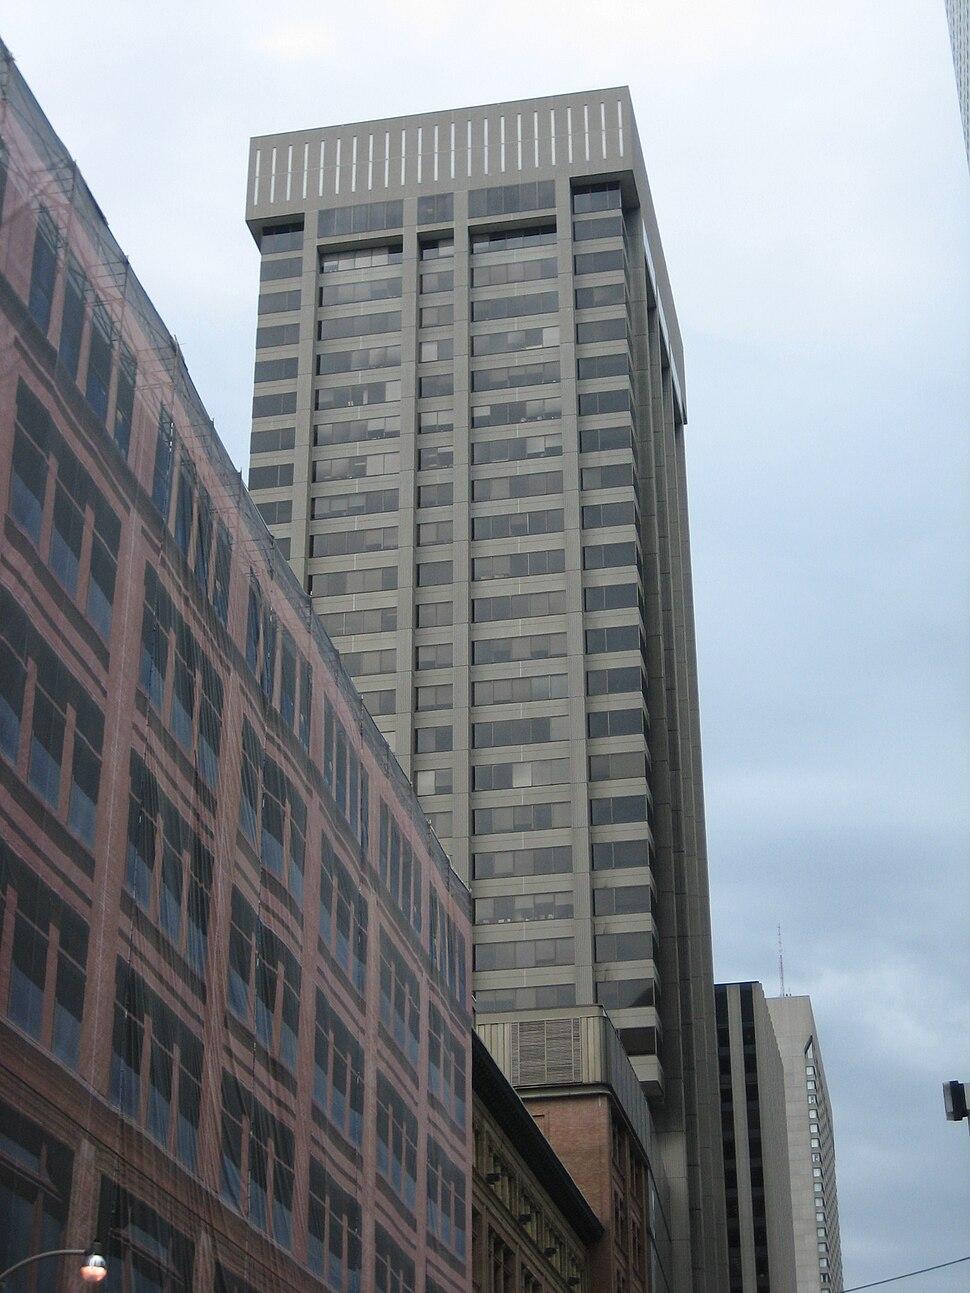 Simpson Tower